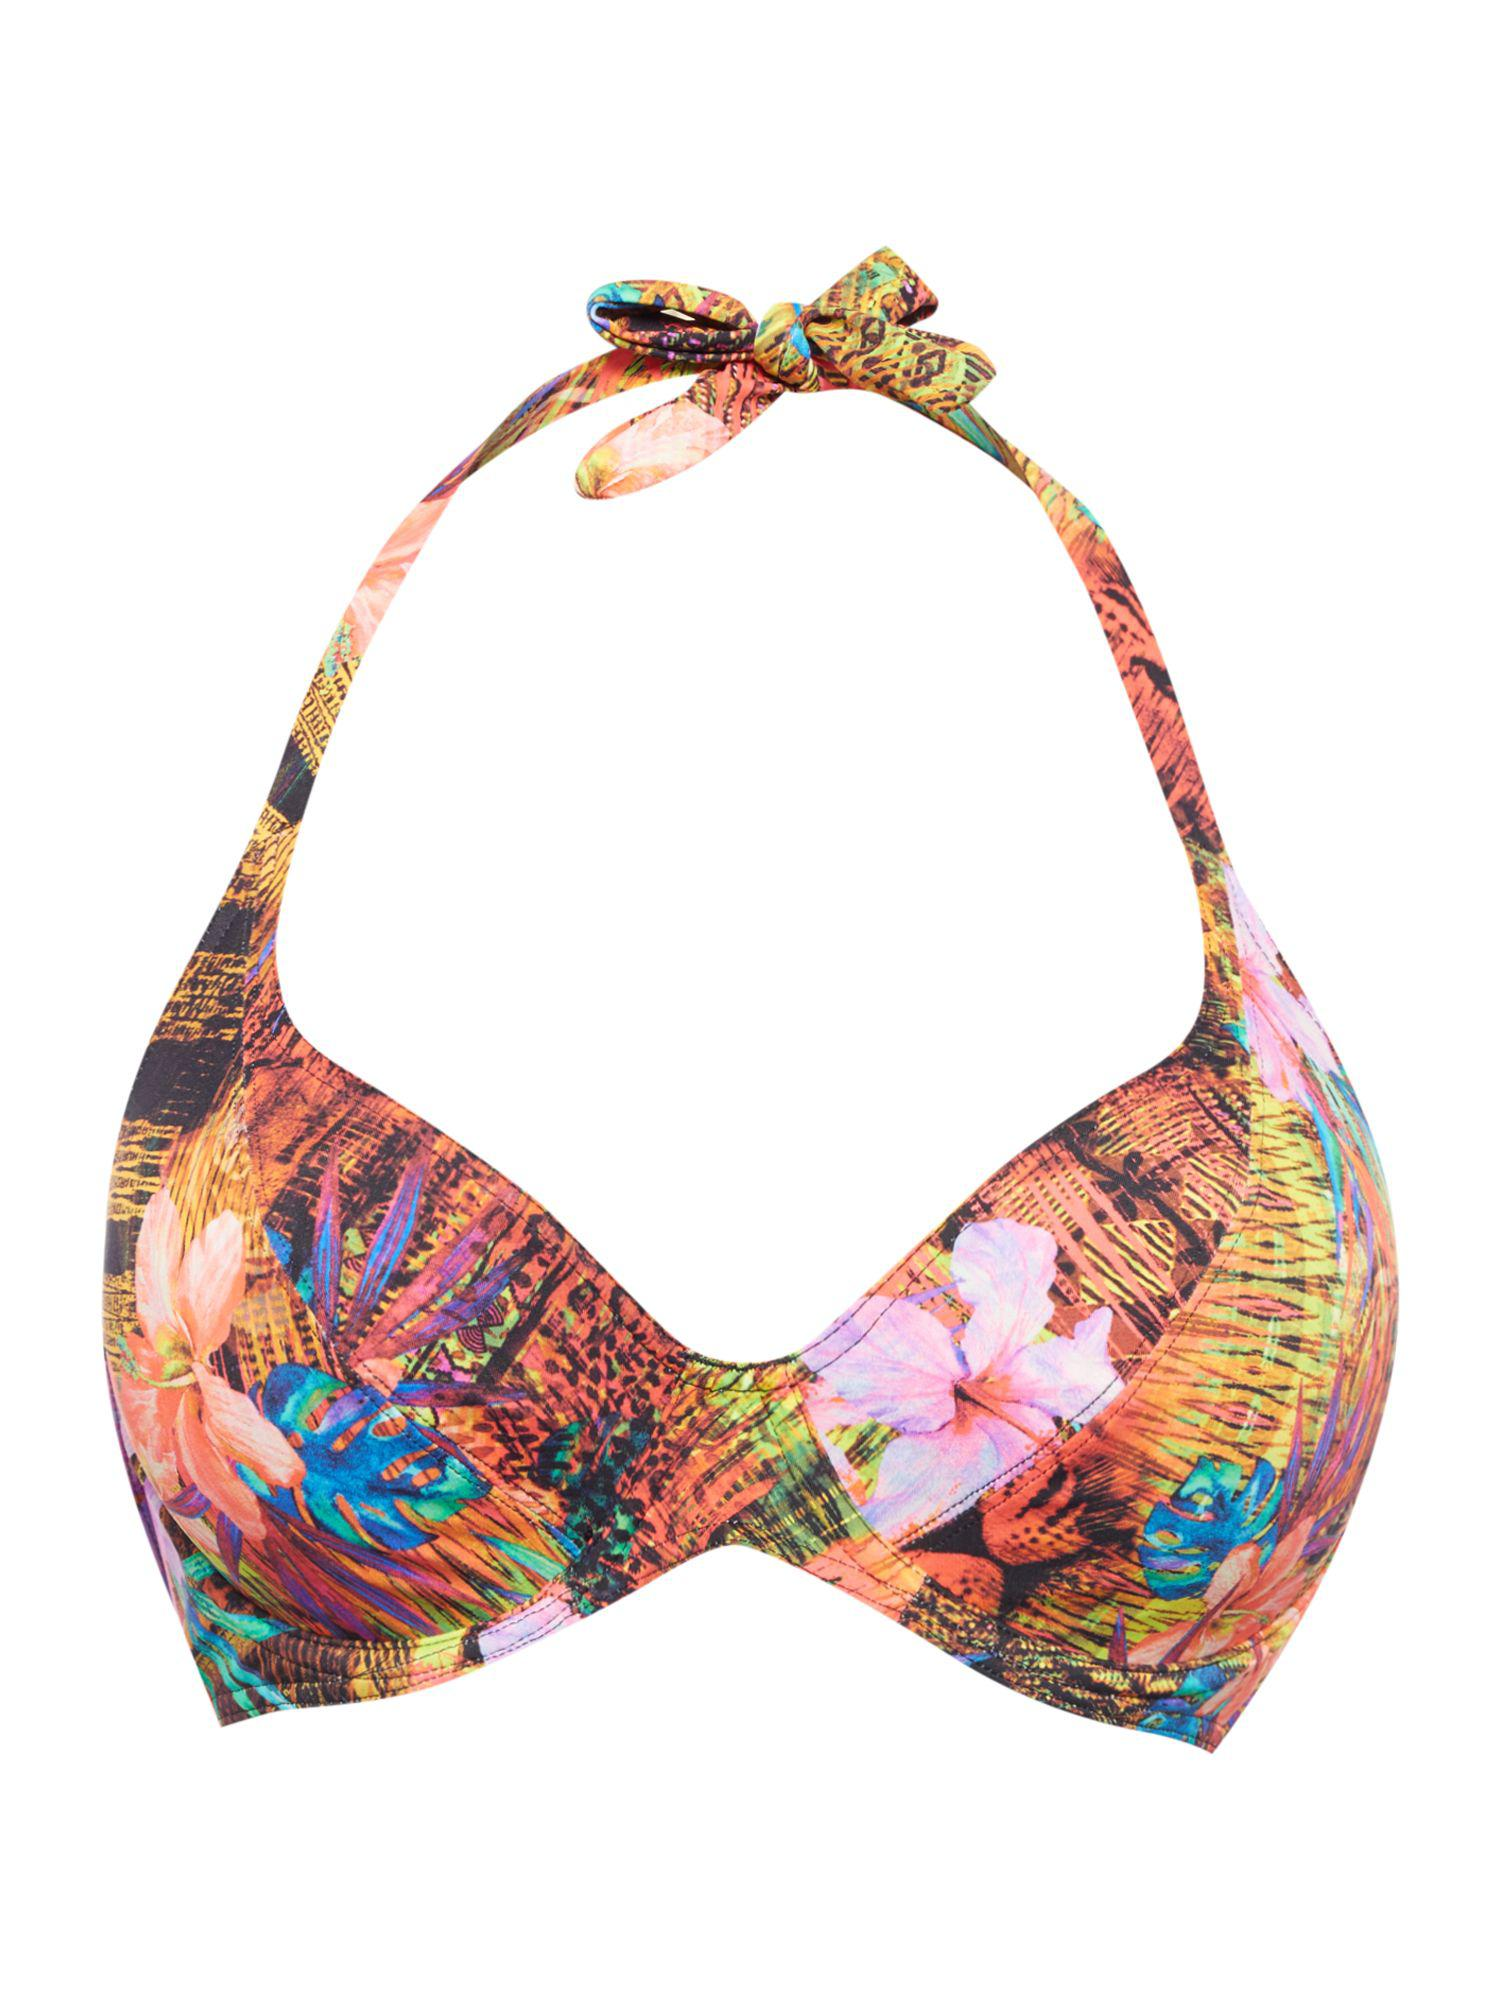 422d46d5ccc1d3 Freya Safari Beach Underwired Halter Bikini Top - Lyst